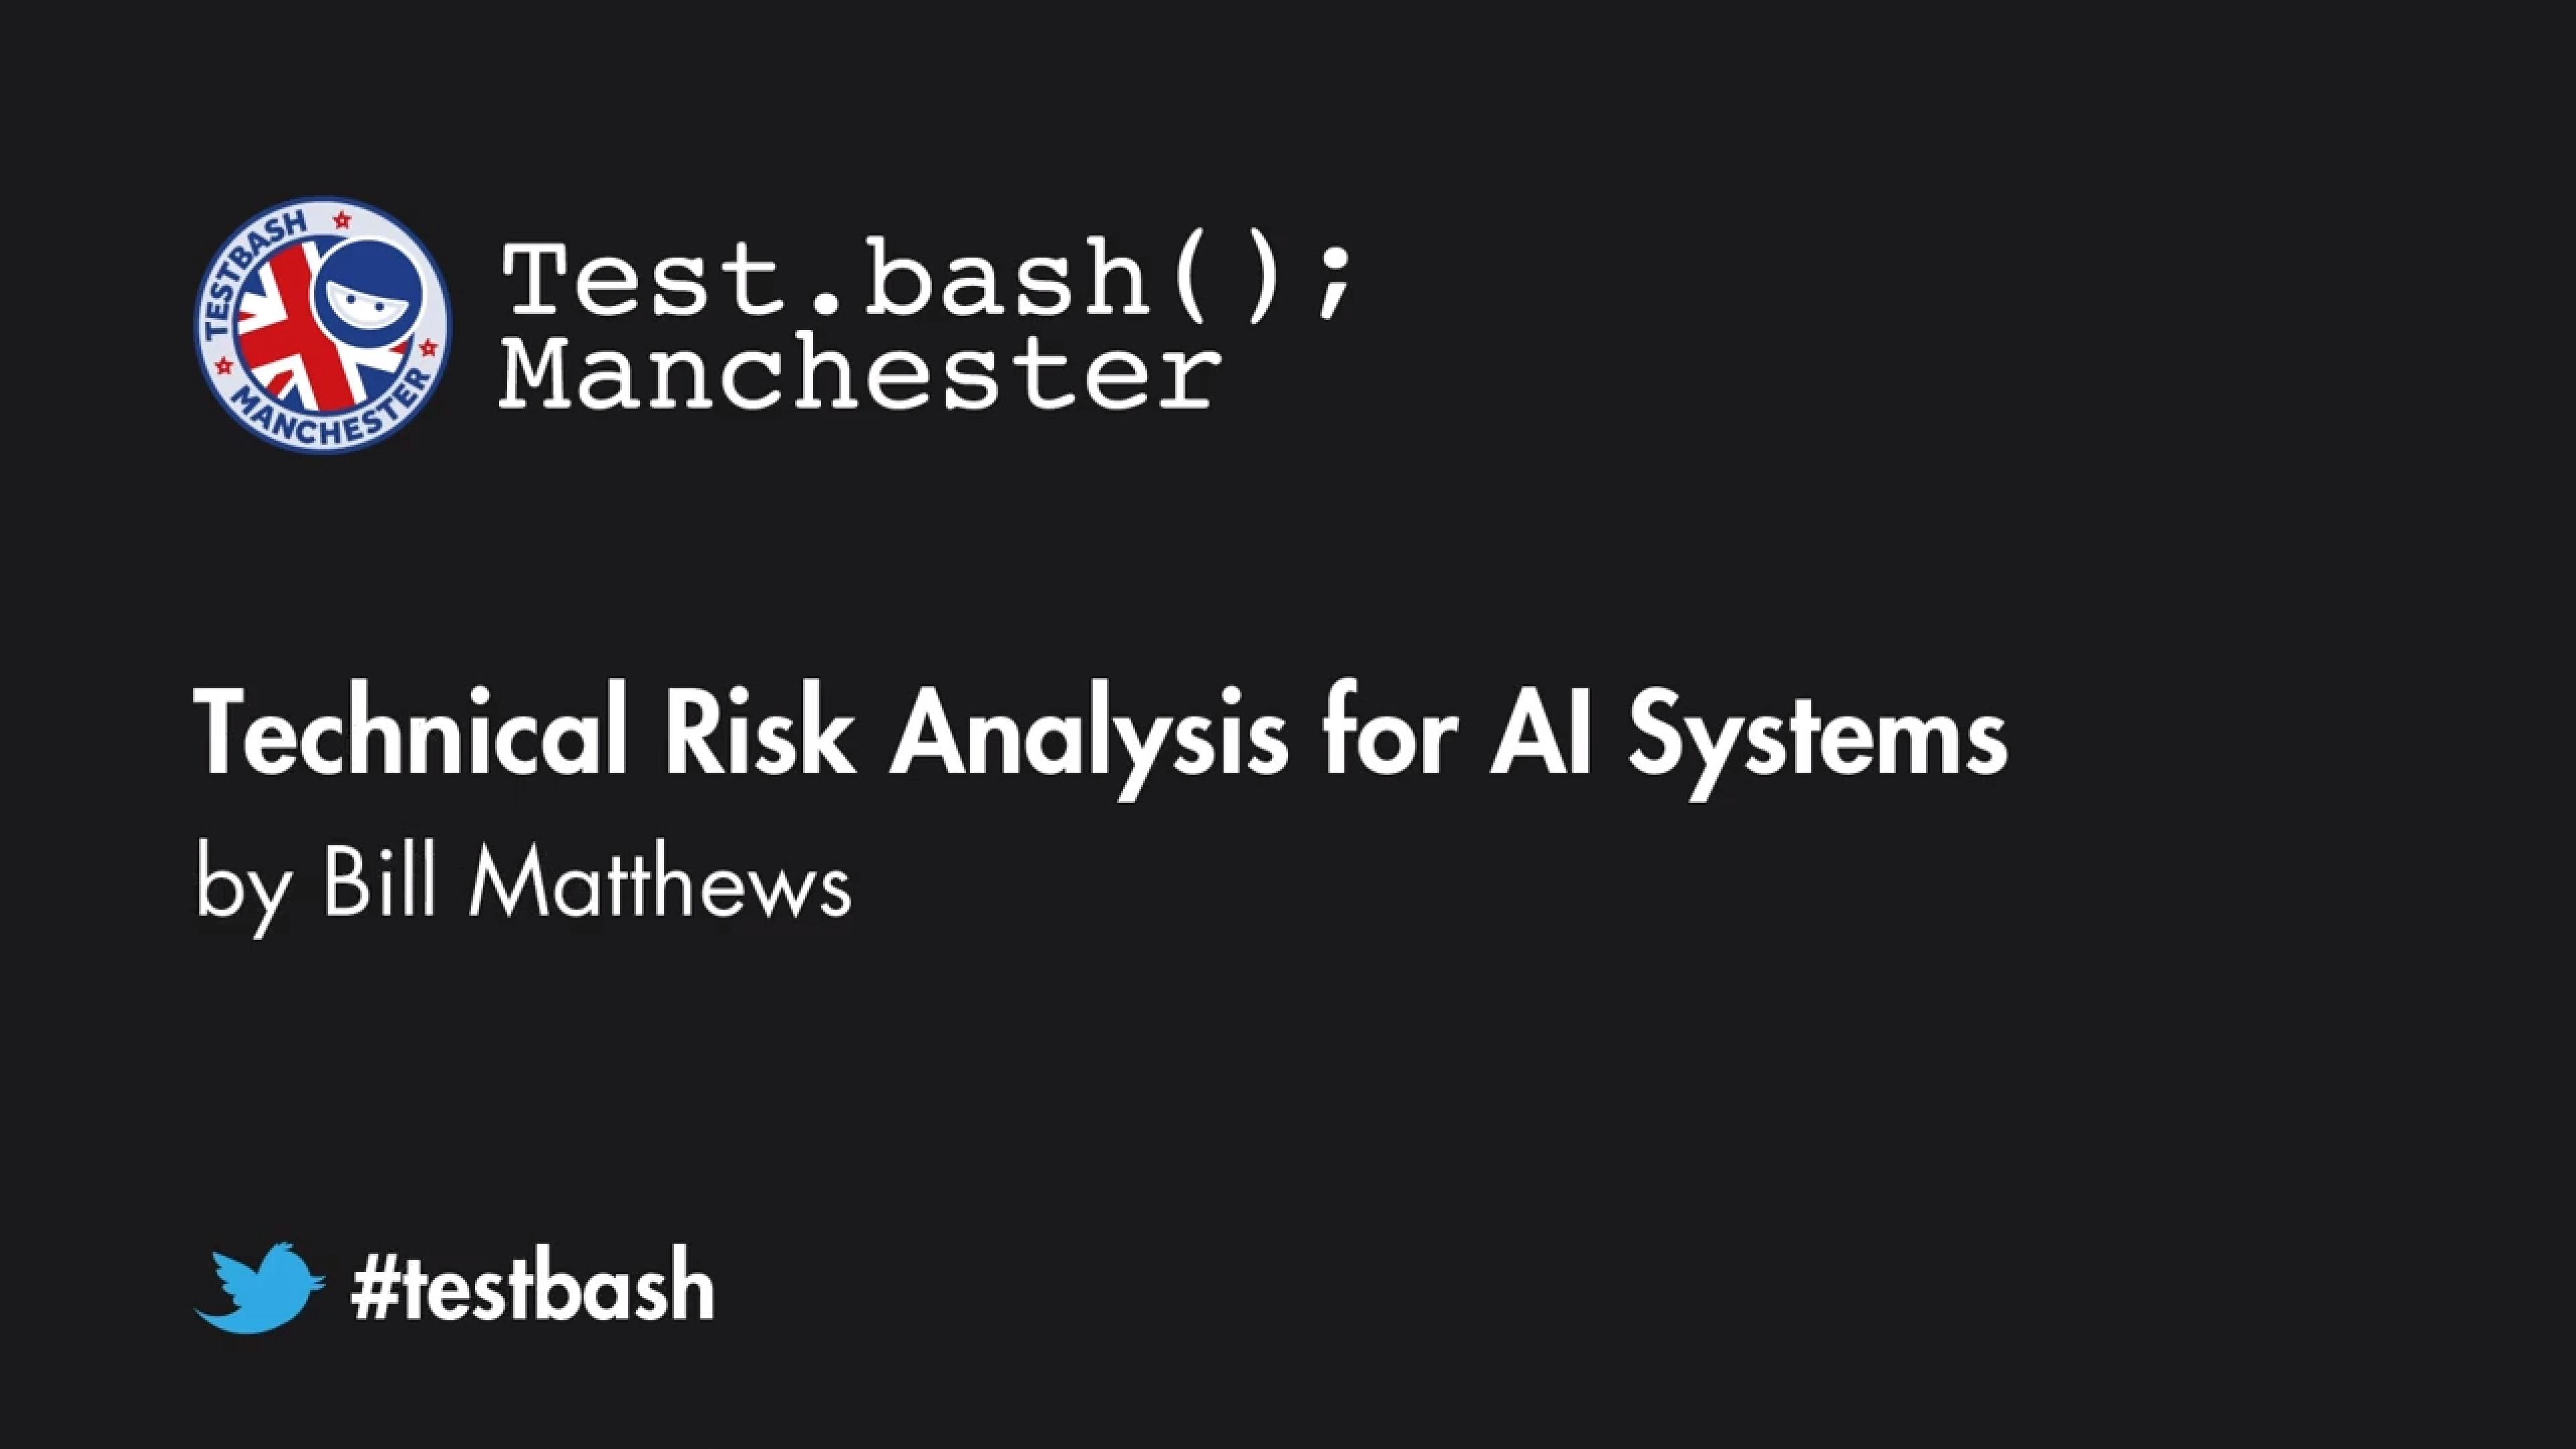 Technical Risk Analysis for AI Systems - Bill Matthews